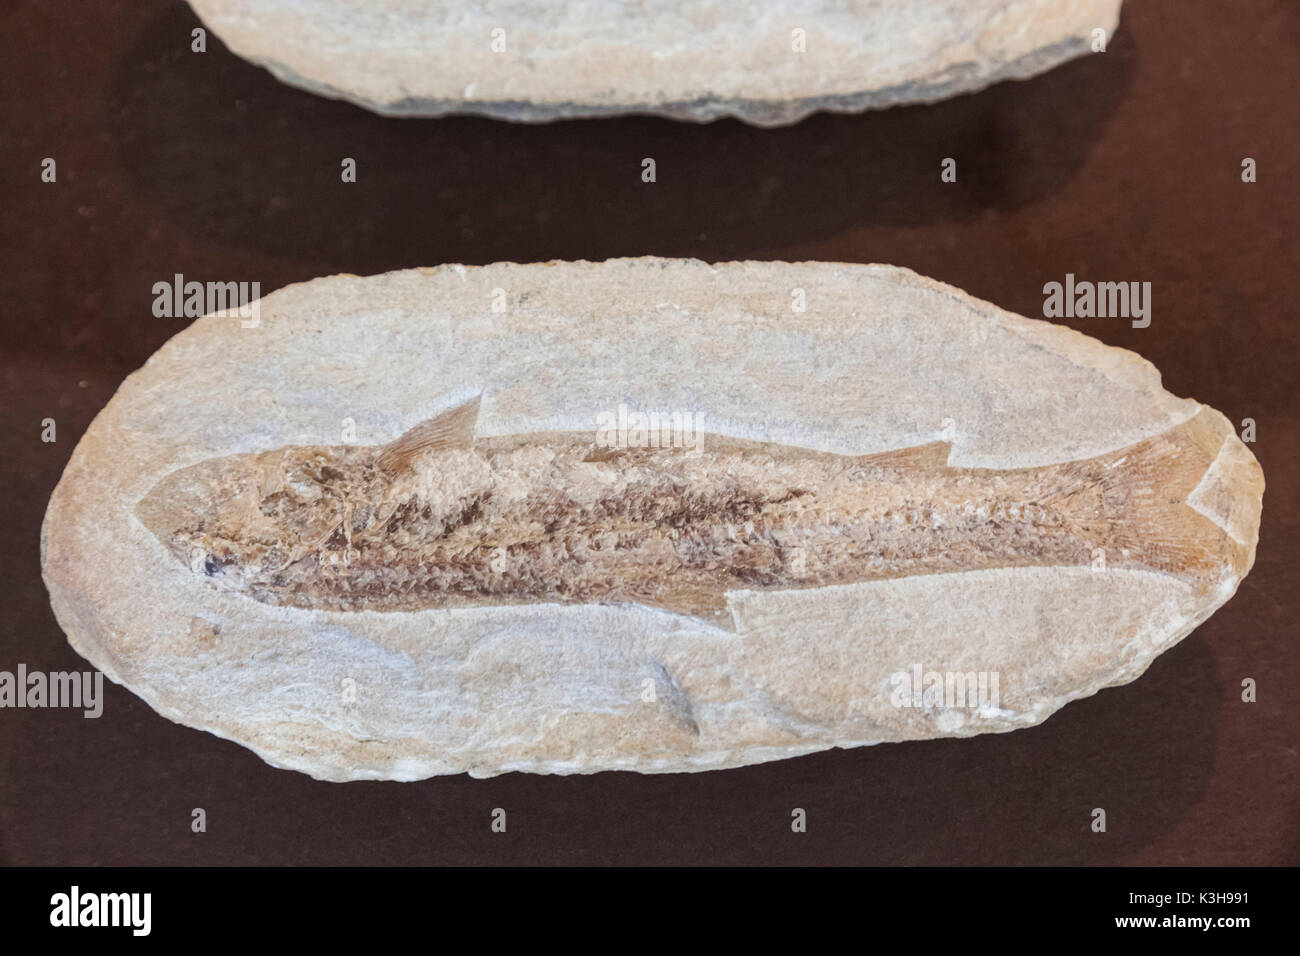 Germany, Bavaria, Munich, The German Hunting and Fishing Museum (Deutsches Jagd-Und Fischereimuseum), Exhibit of Fish Fossil - Stock Image